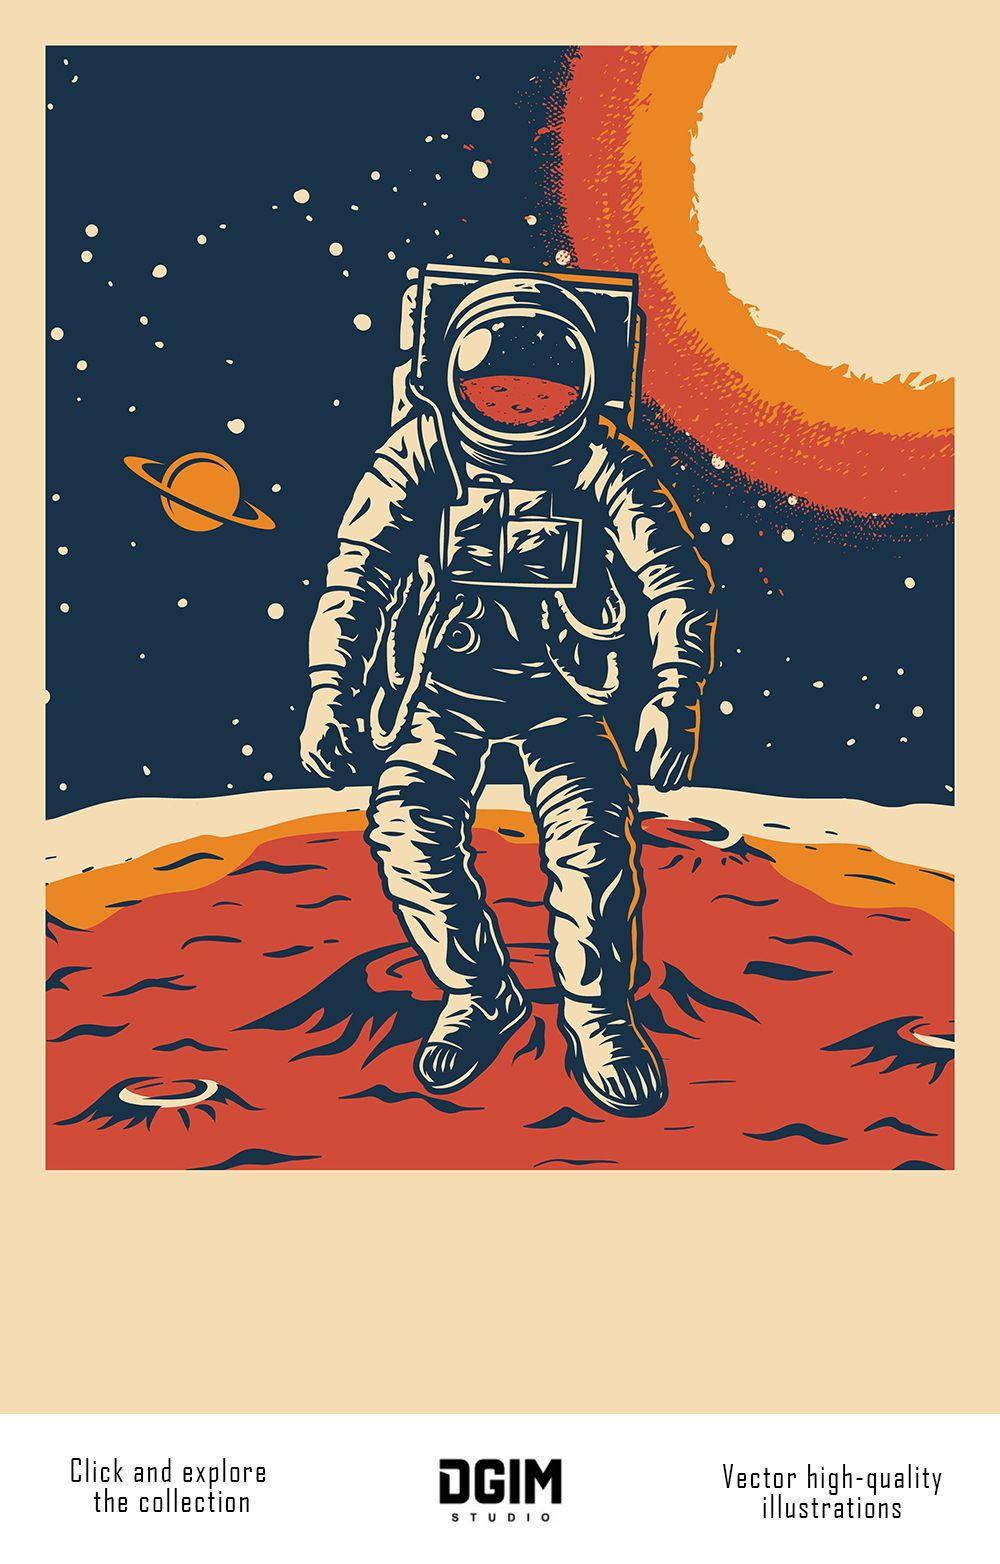 Vintage Space Emblems Set In 2020 Retro Space Posters Vintage Poster Design Retro Poster